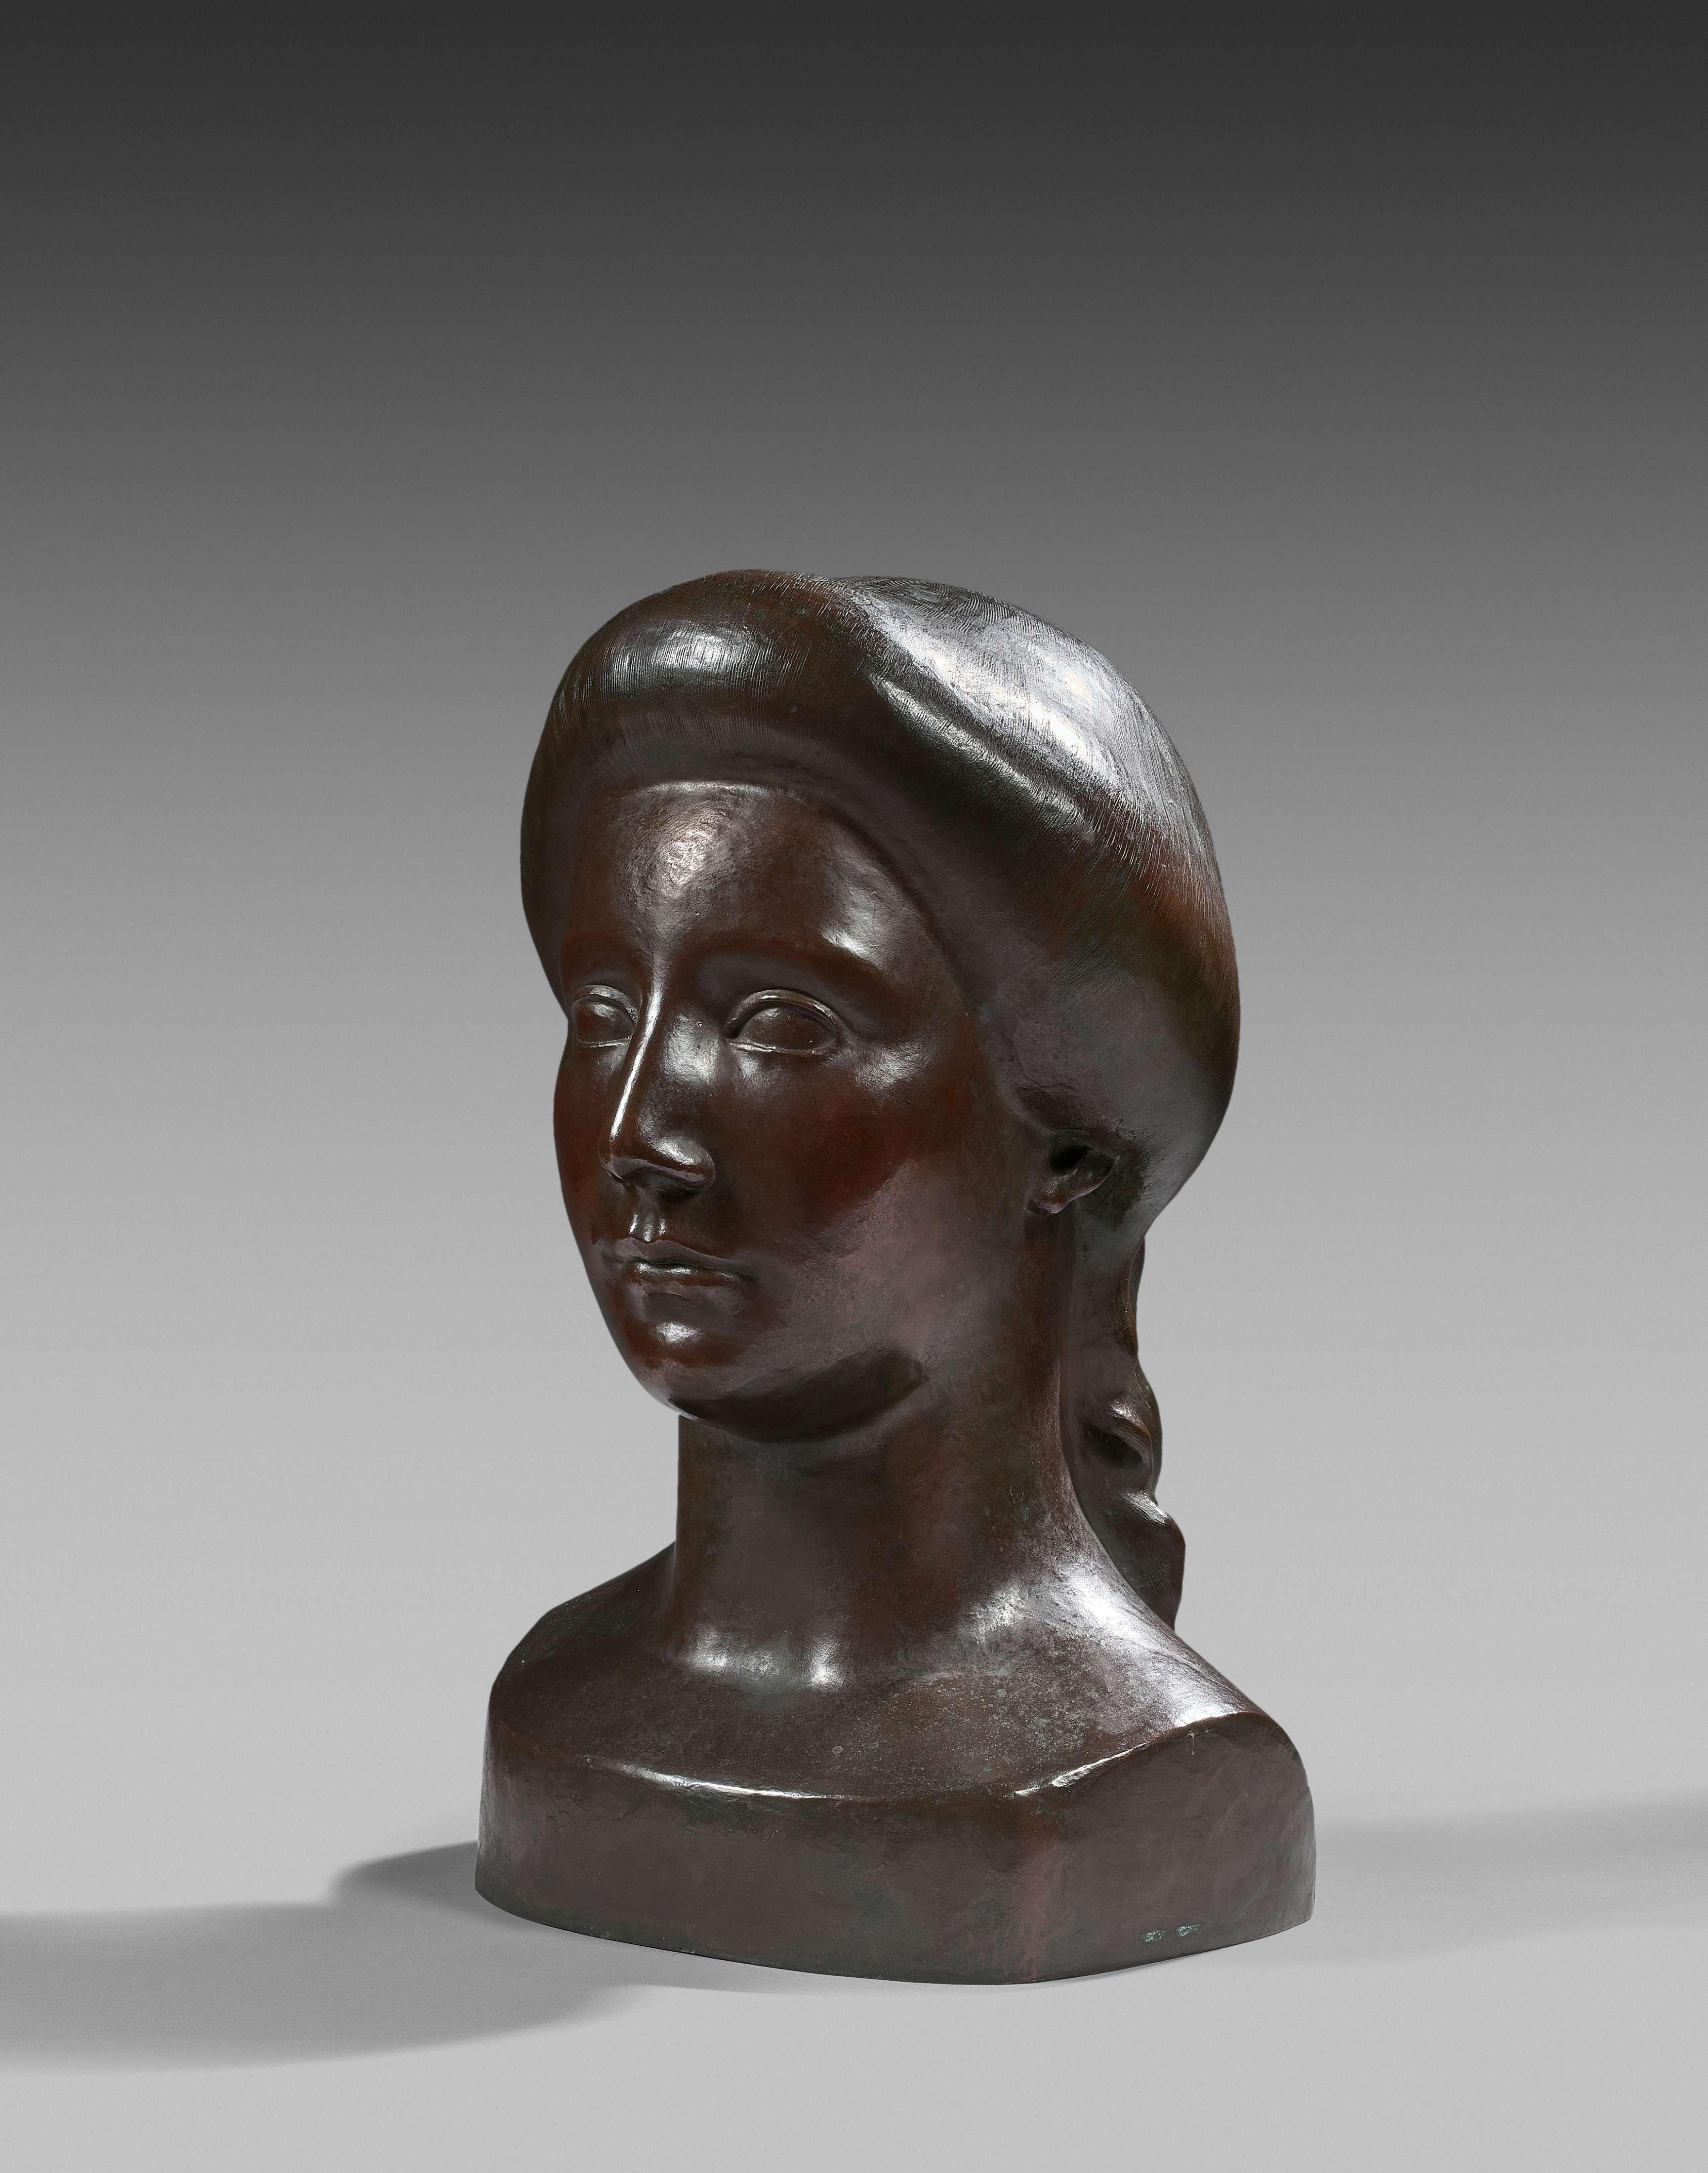 Aristide Maillol, 'Head of Flora', bronze. Photo: Artcurial